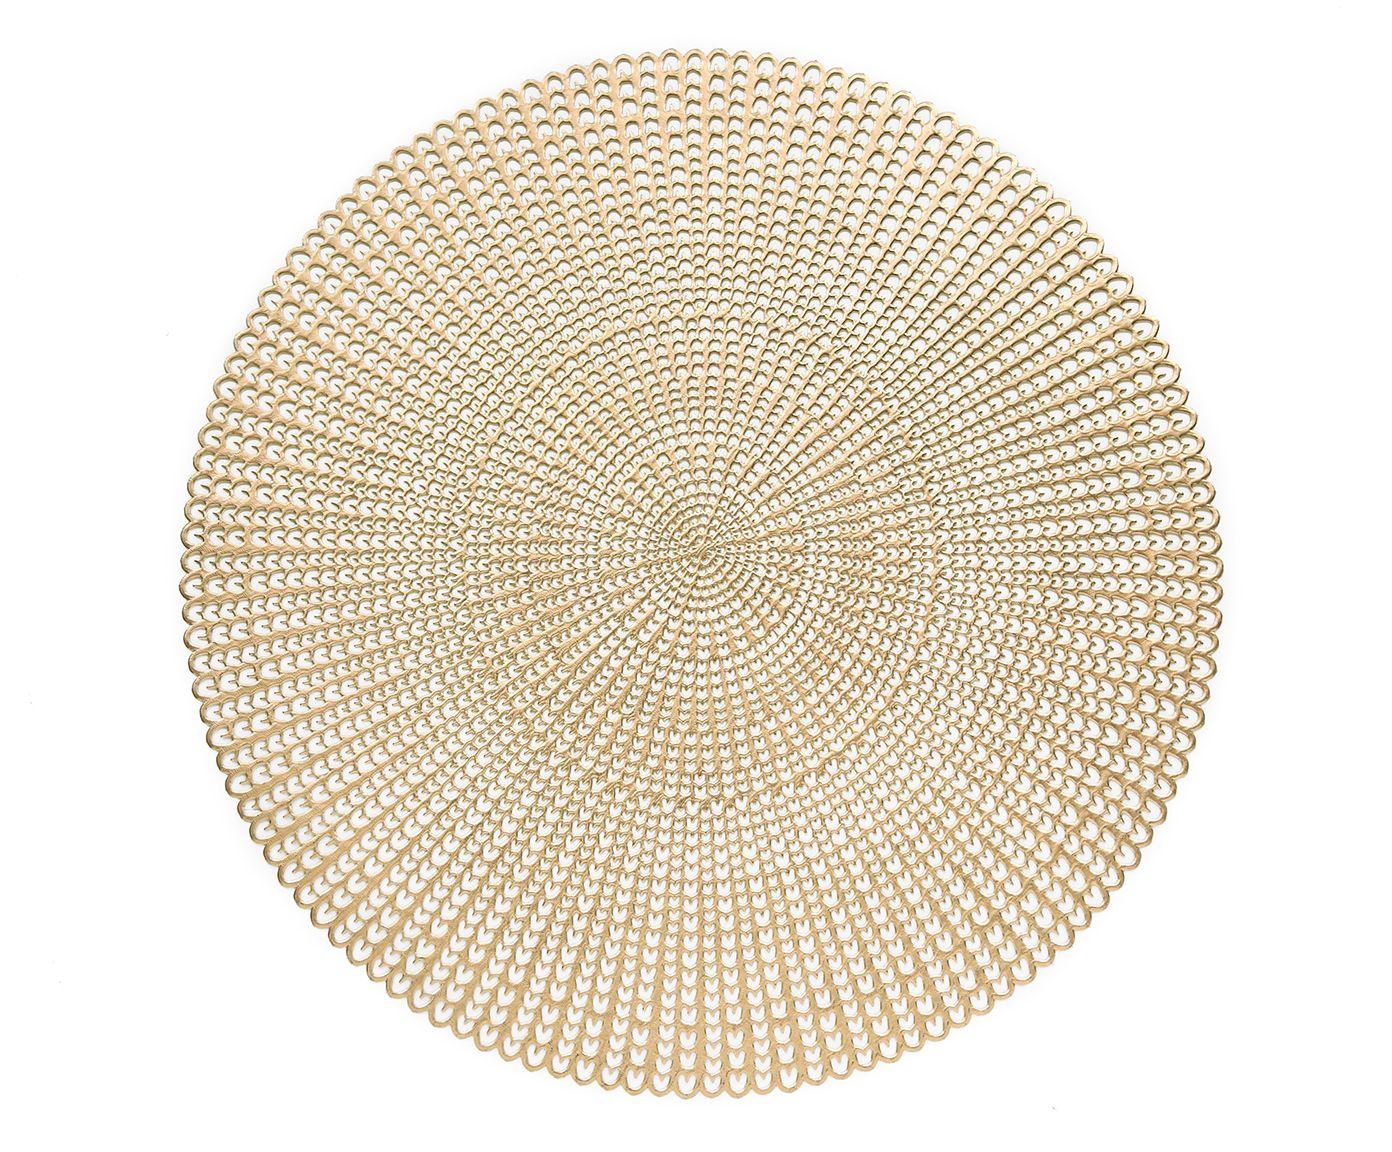 Sousplat Concept Dourado - 42cm | Westwing.com.br